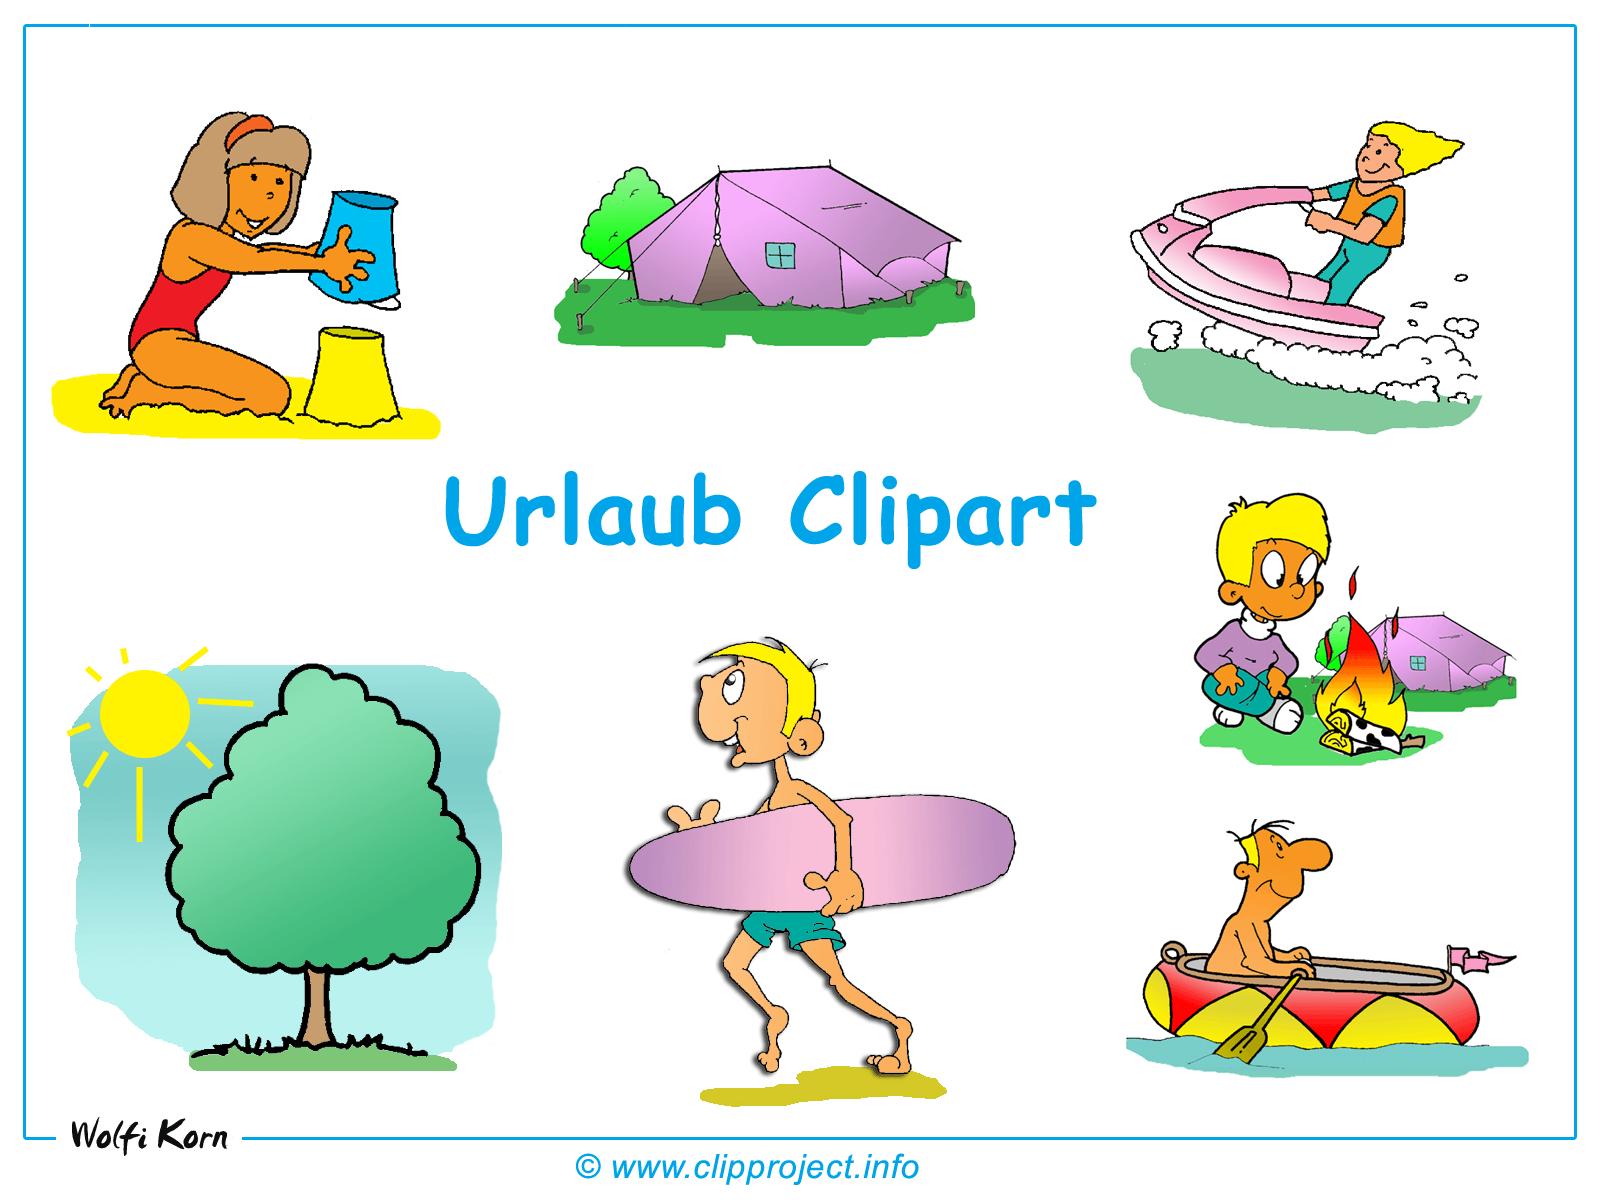 Clipart urlaub kostenlos svg freeuse Urlaub Clipart - Desktopbild kostenlos svg freeuse